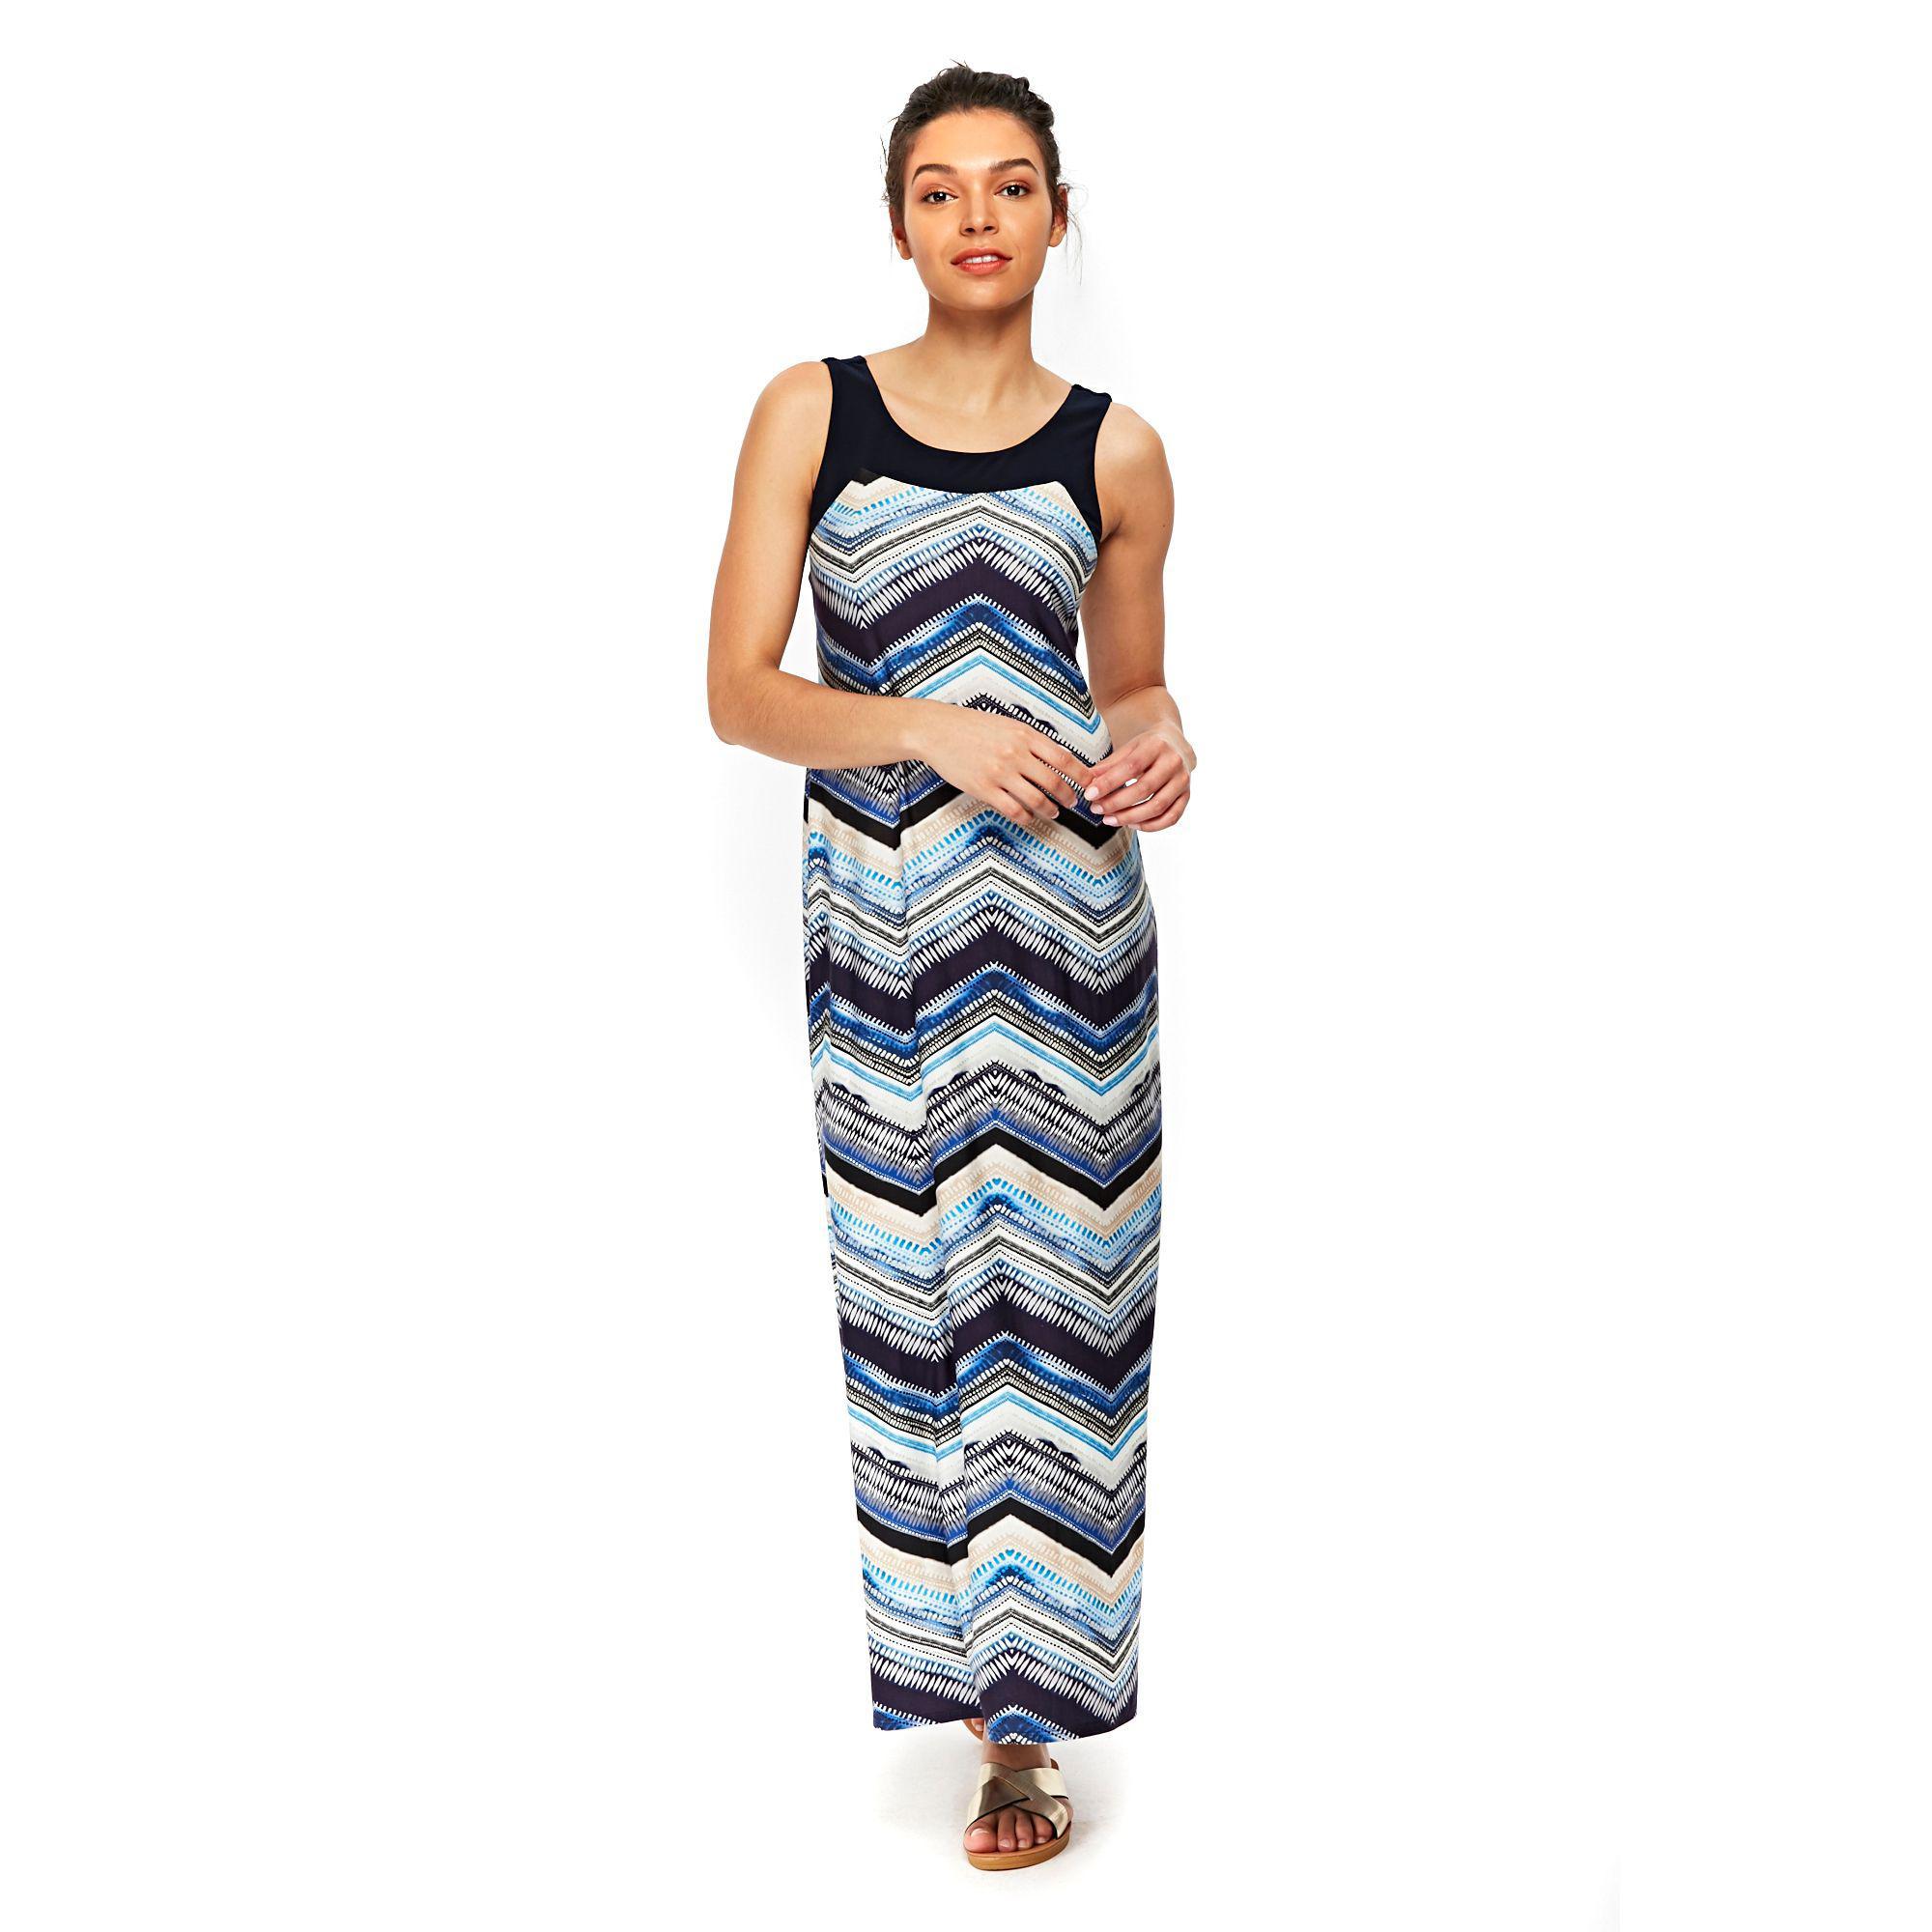 b9a180f75e832 Gallery. Previously sold at: Debenhams · Women's Blue Dresses Women's  Geometric ...